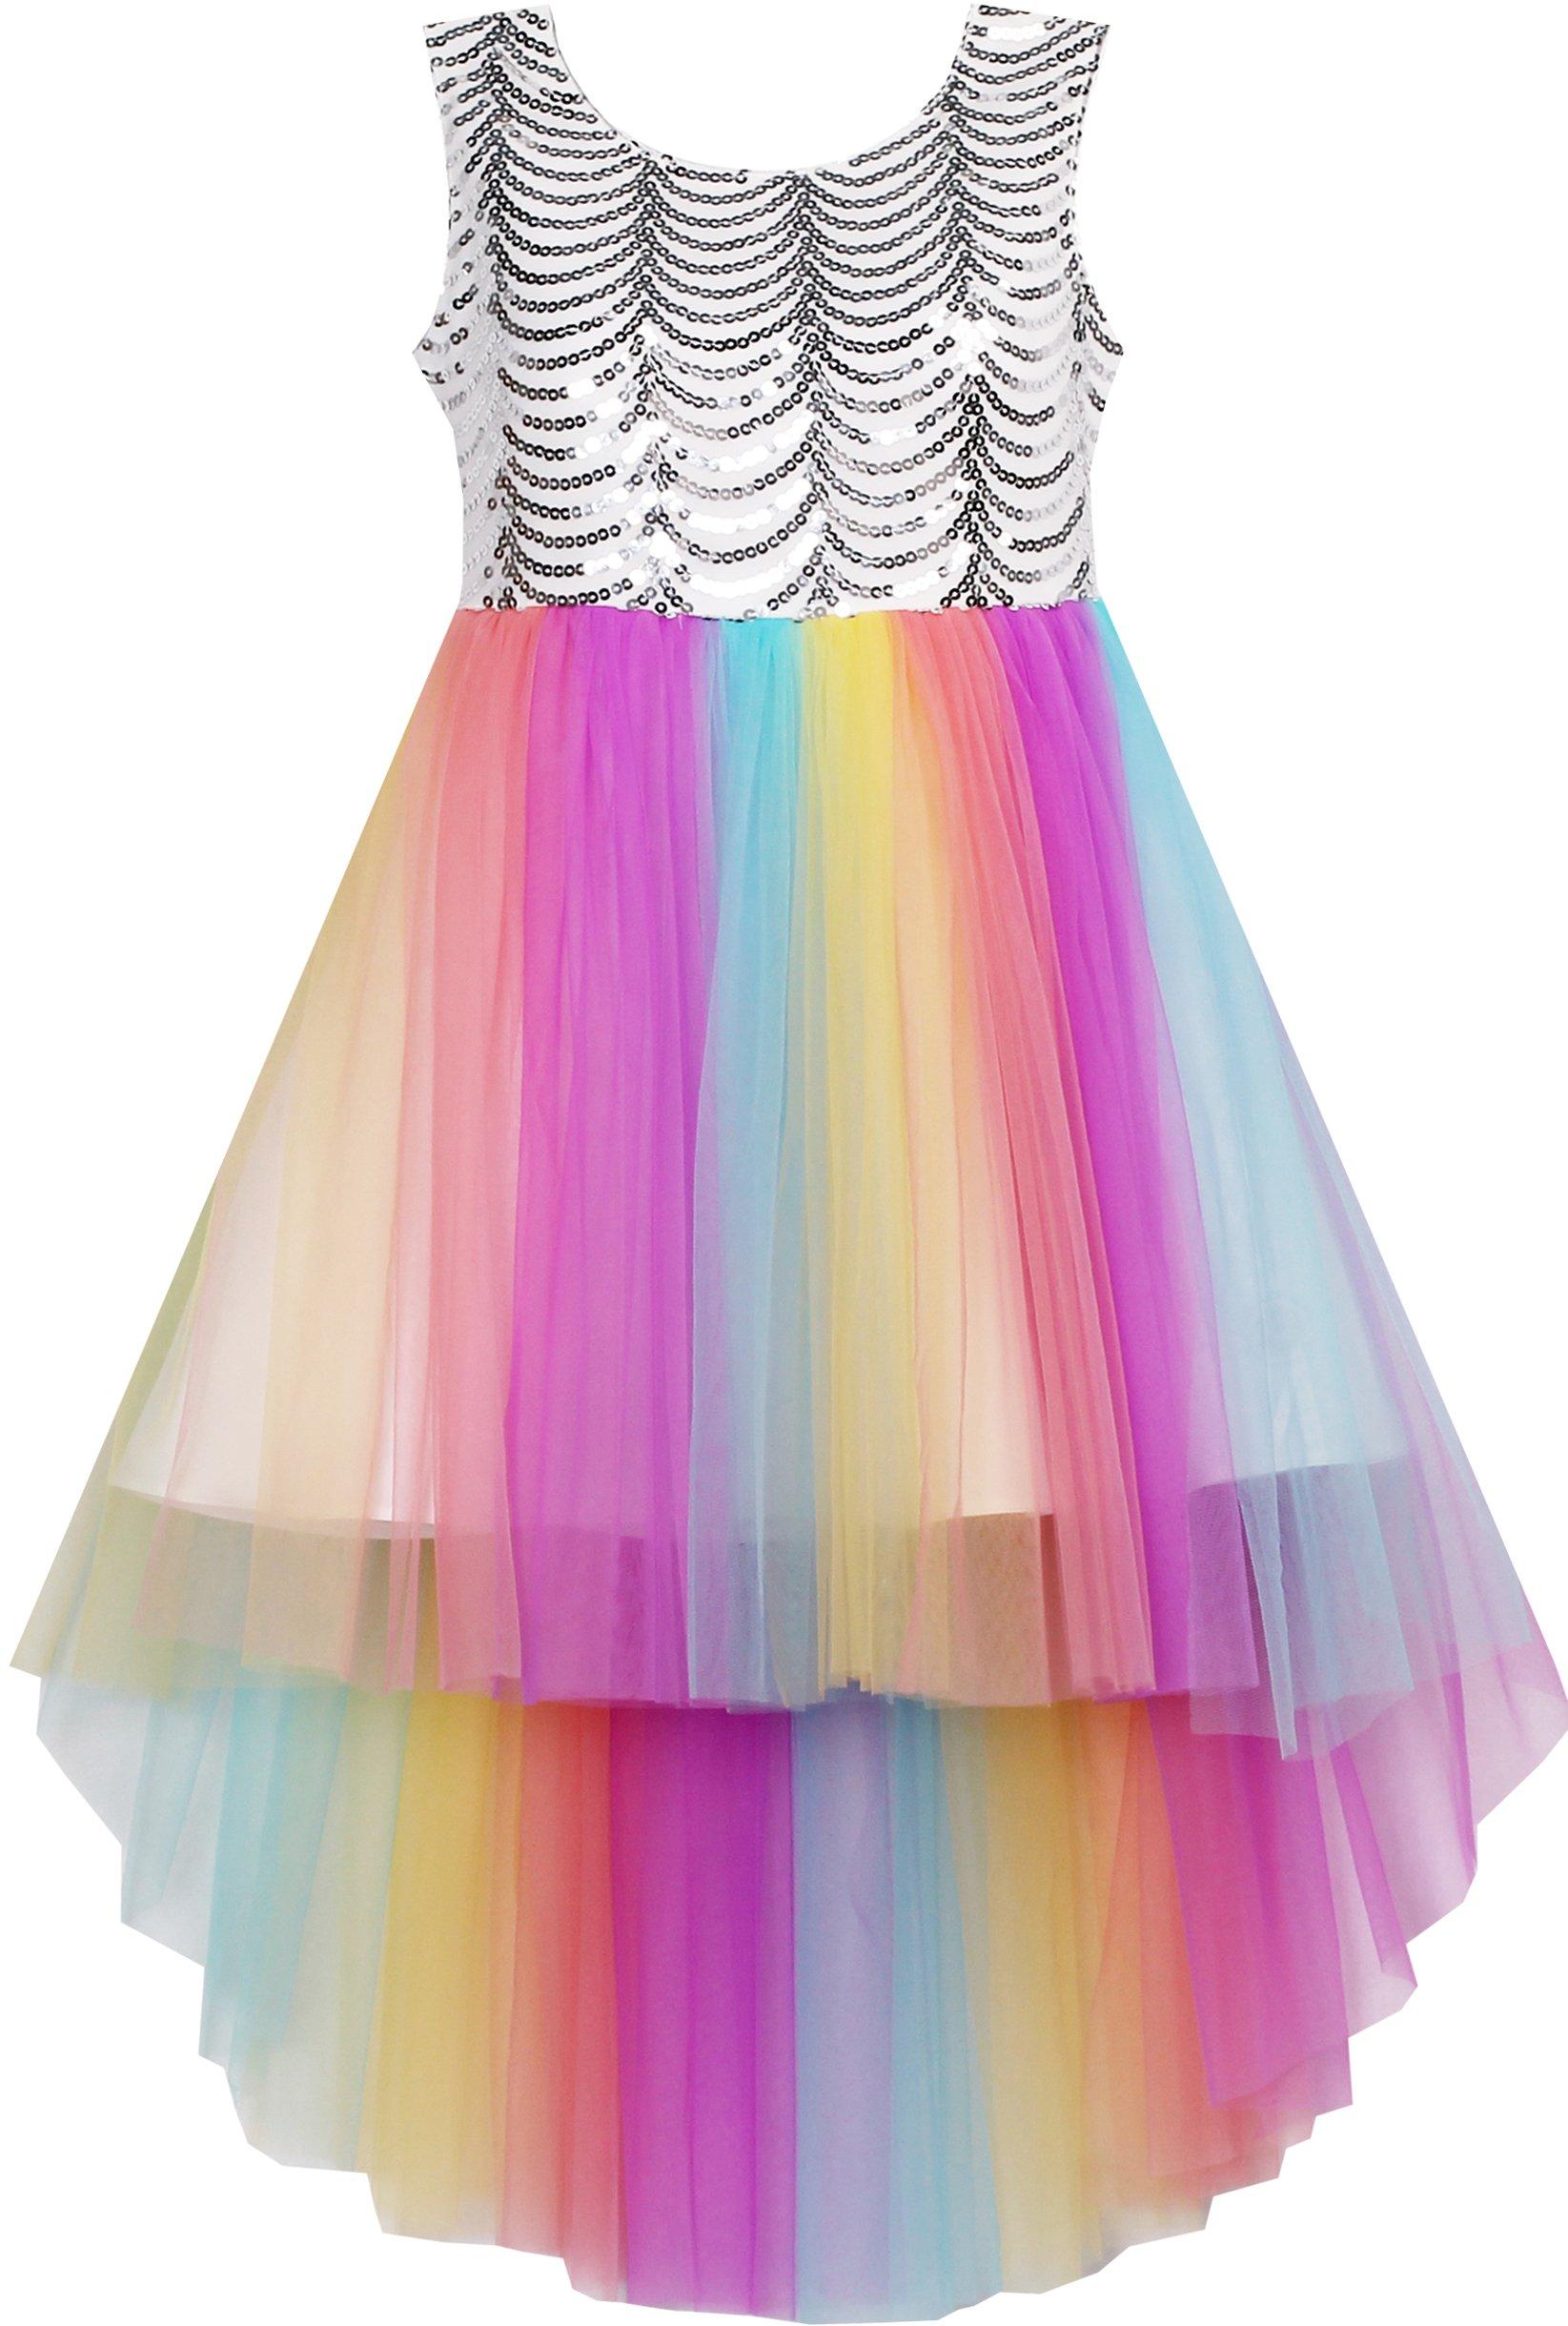 e2bd070e131 Sunny Fashion Girls Dress Sequin Mesh Party Wedding Princess Tulle product  image